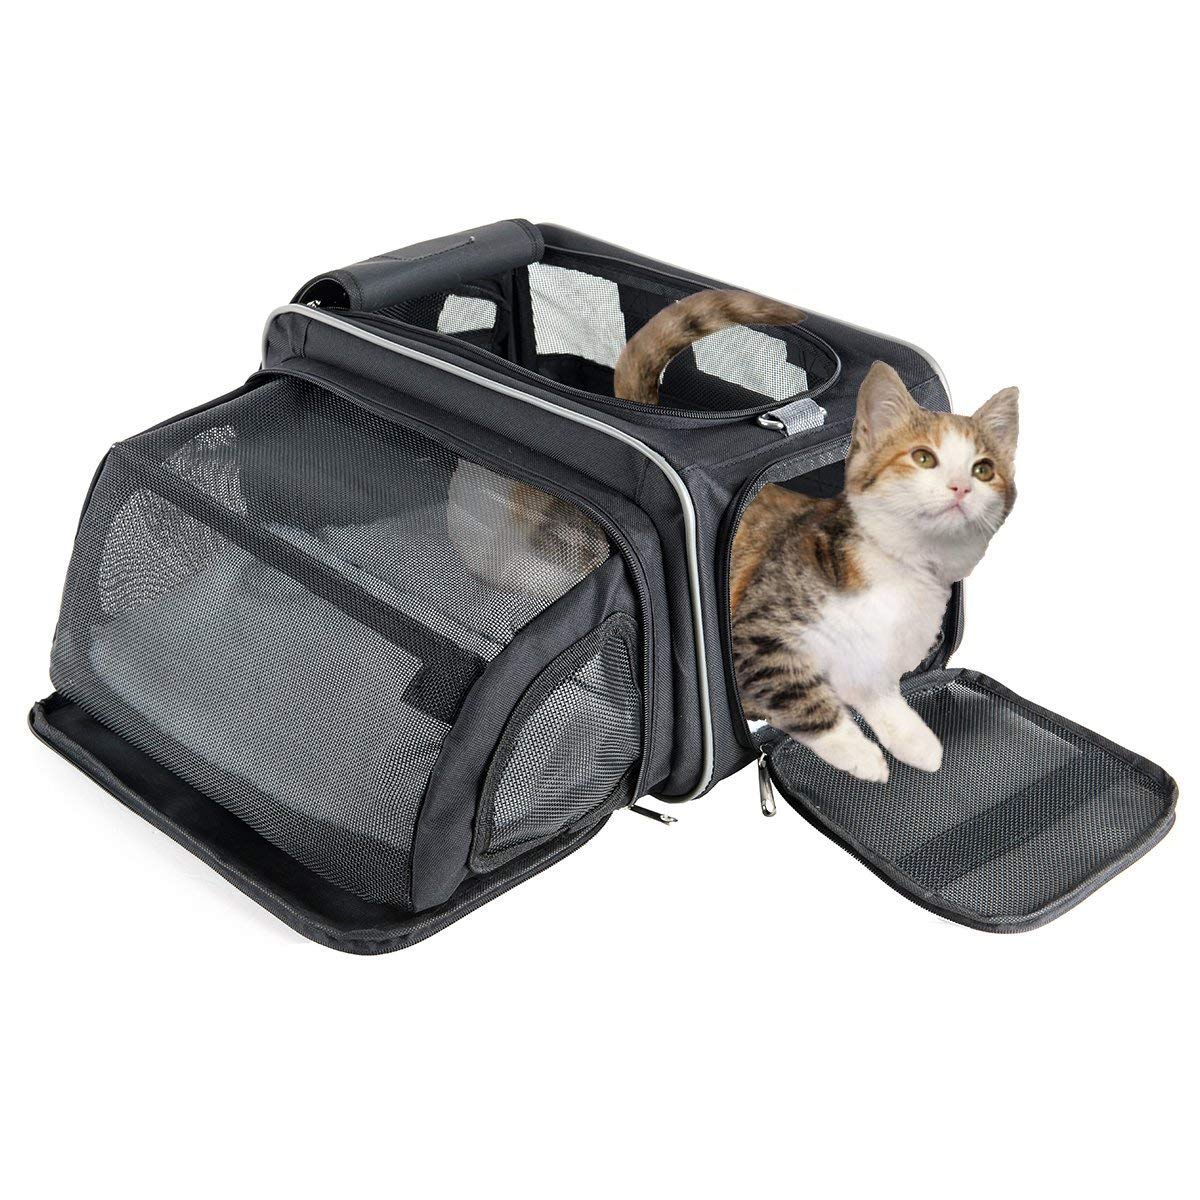 Long Fypo Dog Car Seat Belts Buckle, Pet Safety Seatbelt Stabilizer Adjustable Harness Predector Guard for Travel Auto Vehicle Black (Seatbelt (L))